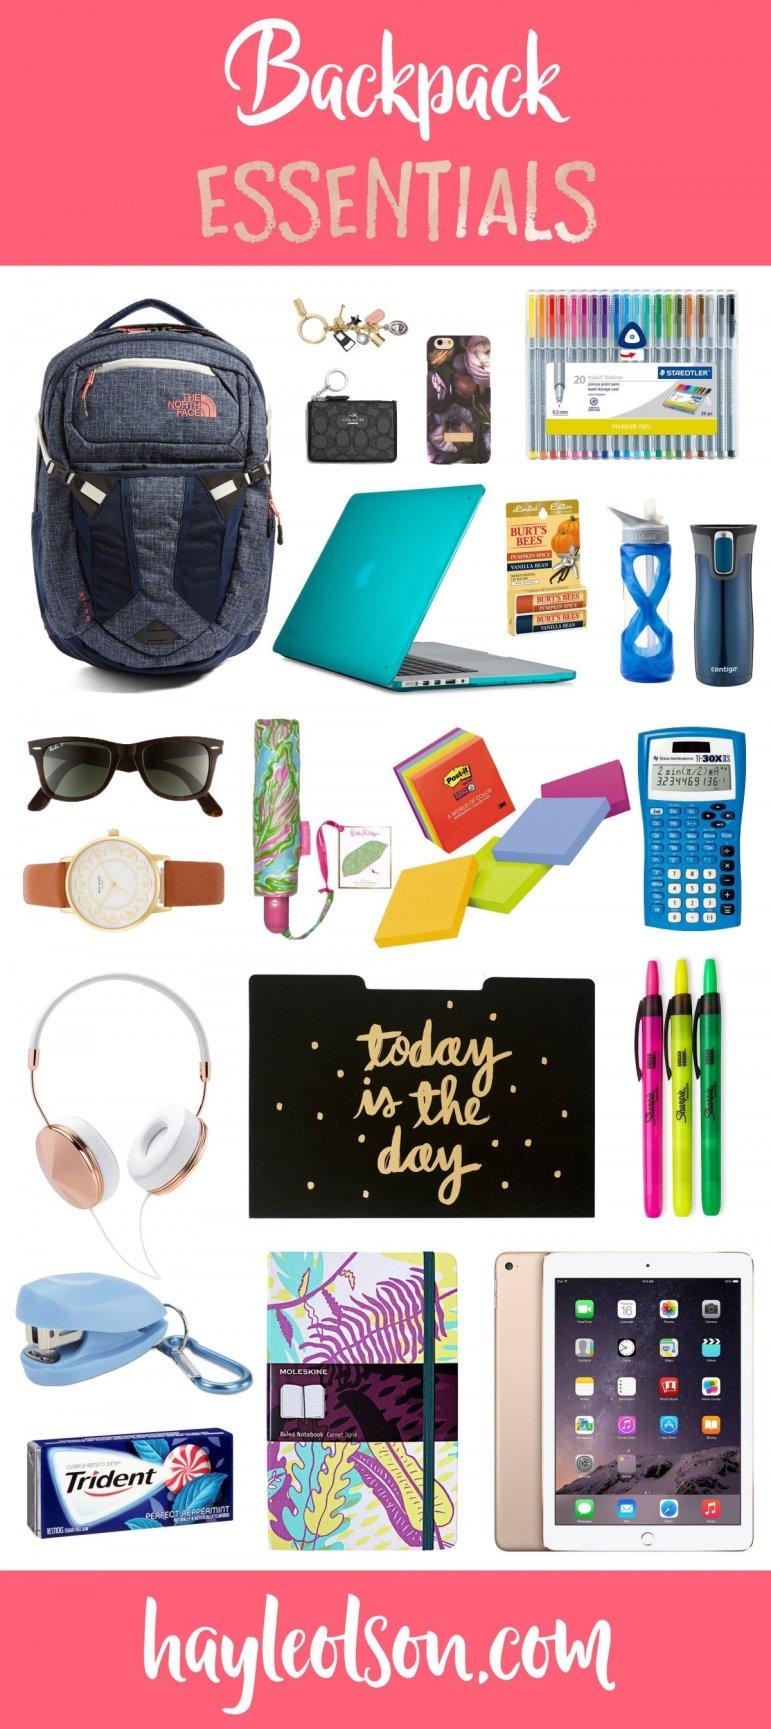 Backpack Essentials | Hayle Olson | www.hayleolson.com